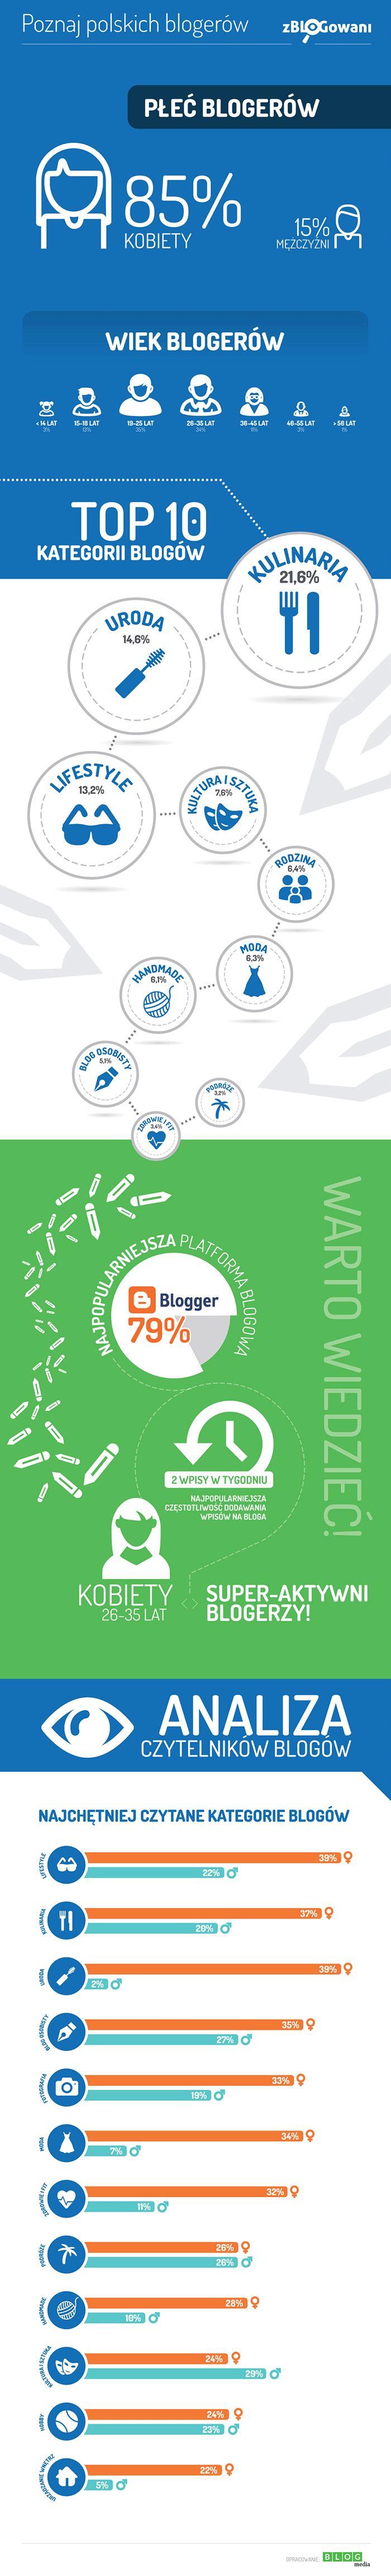 Blogerzy Polscy - infografika